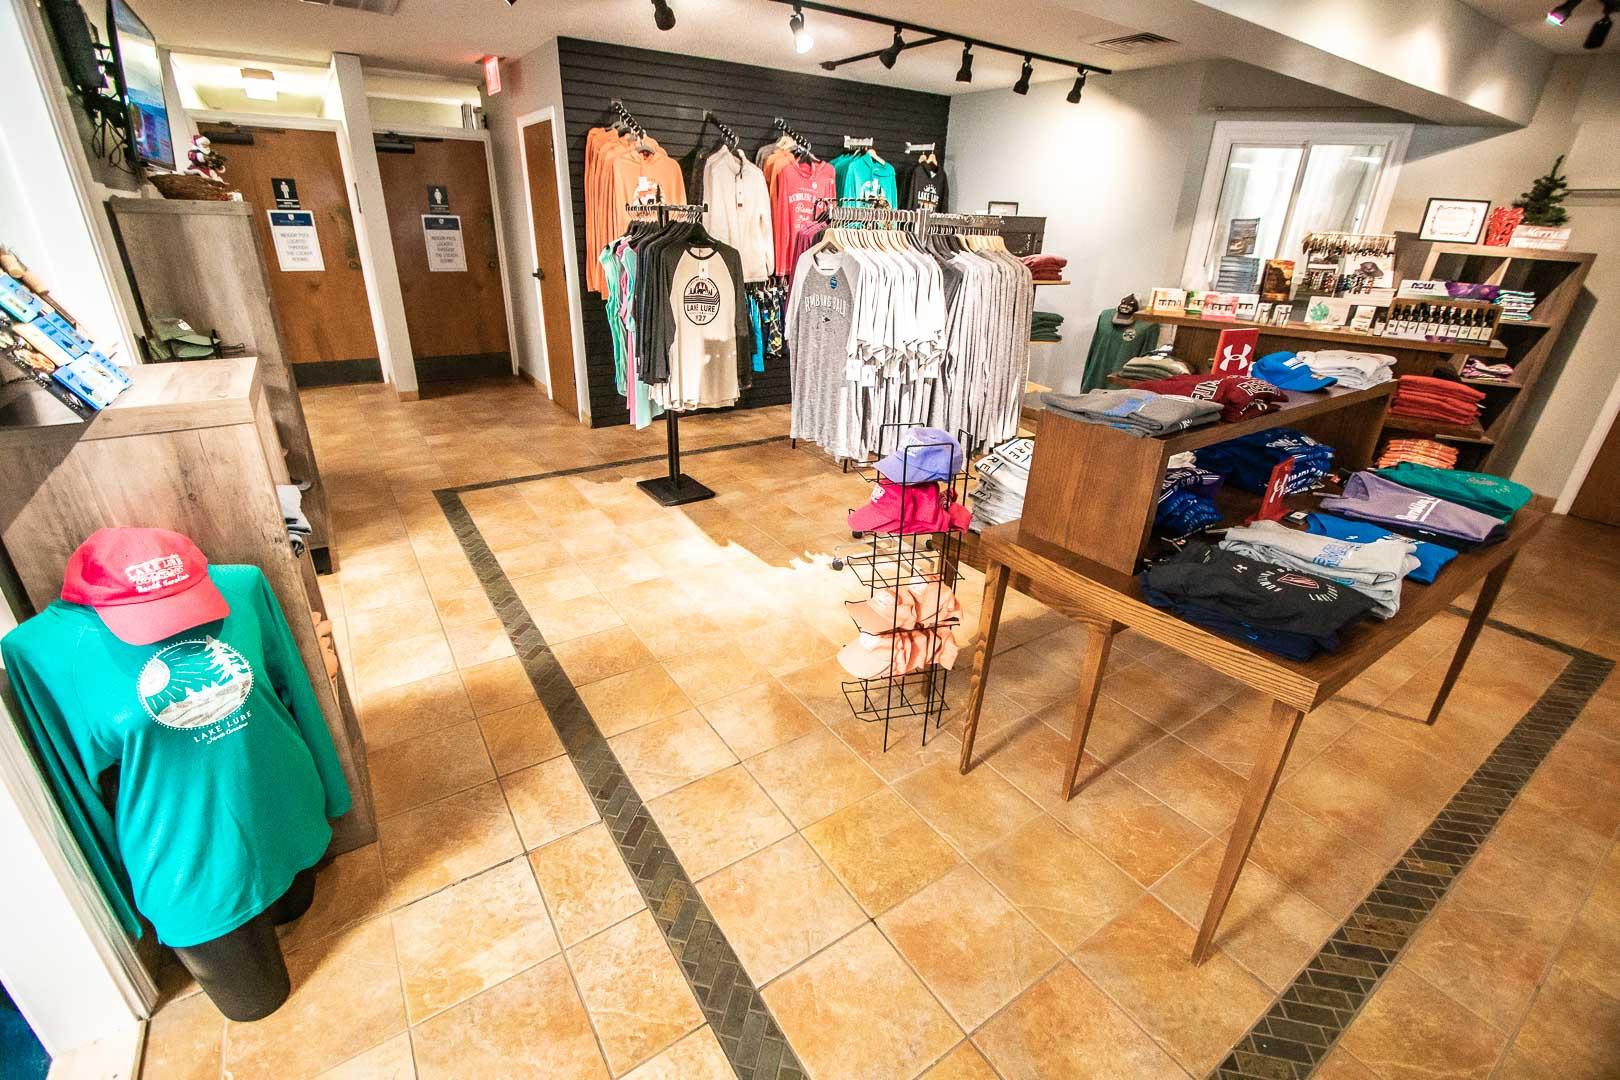 A convenience store available at VRI's Fox Run Resort in North Carolina.